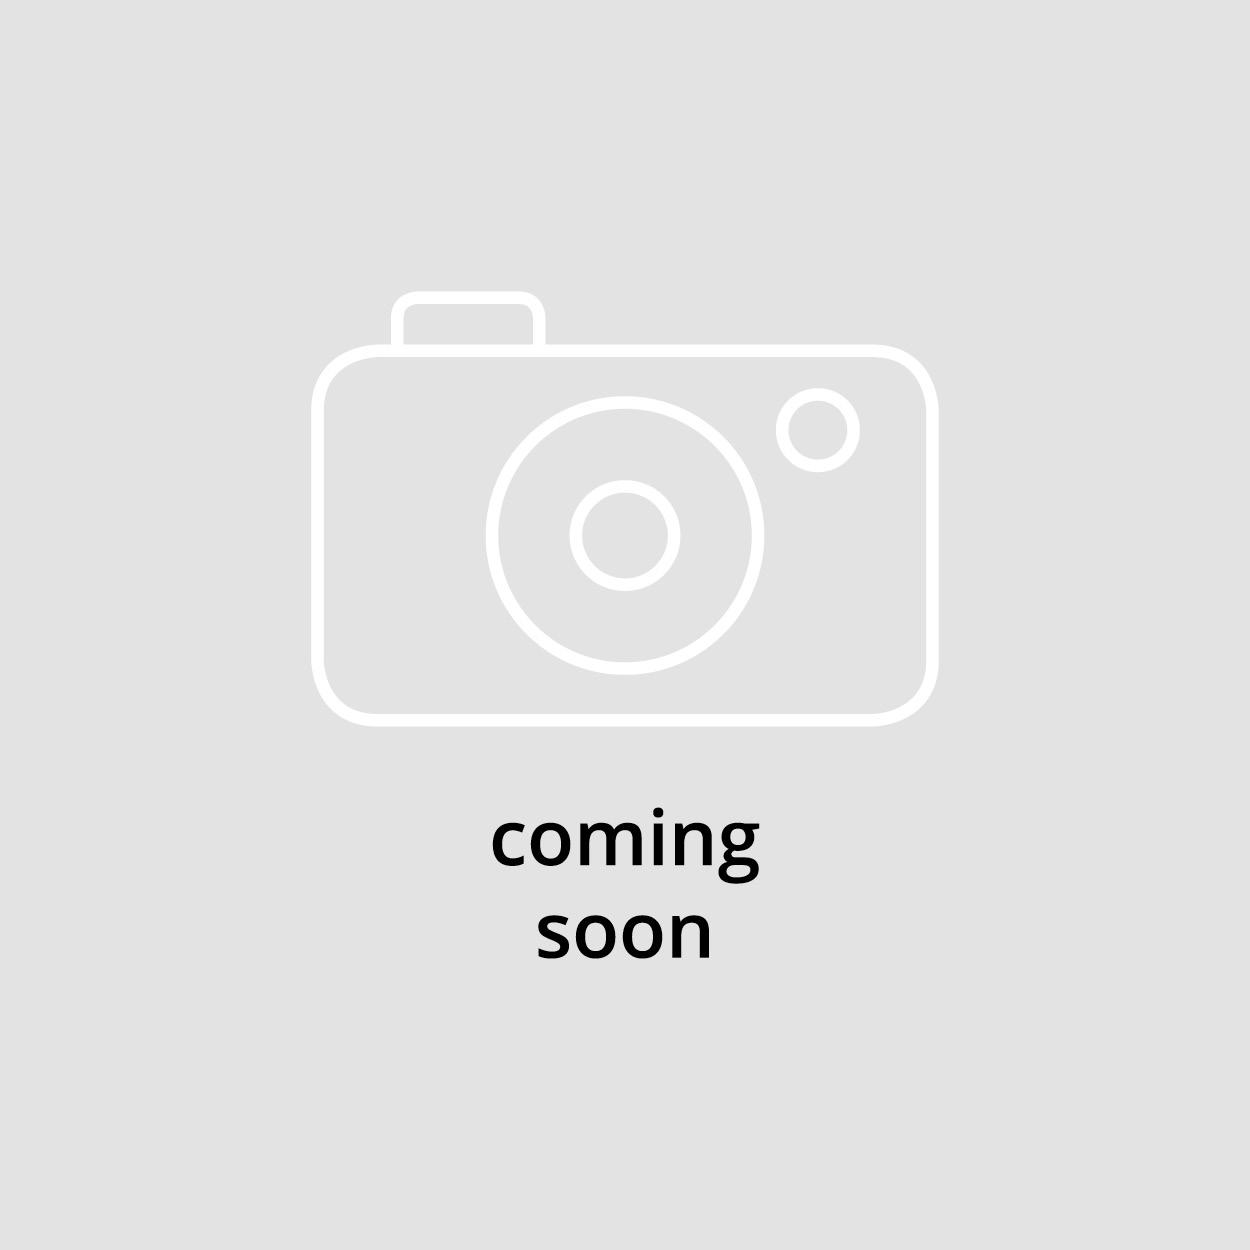 08.18.010 Molla per Portabarre Gildemeister AS16, AS20, GS20, GM20, GM20AC